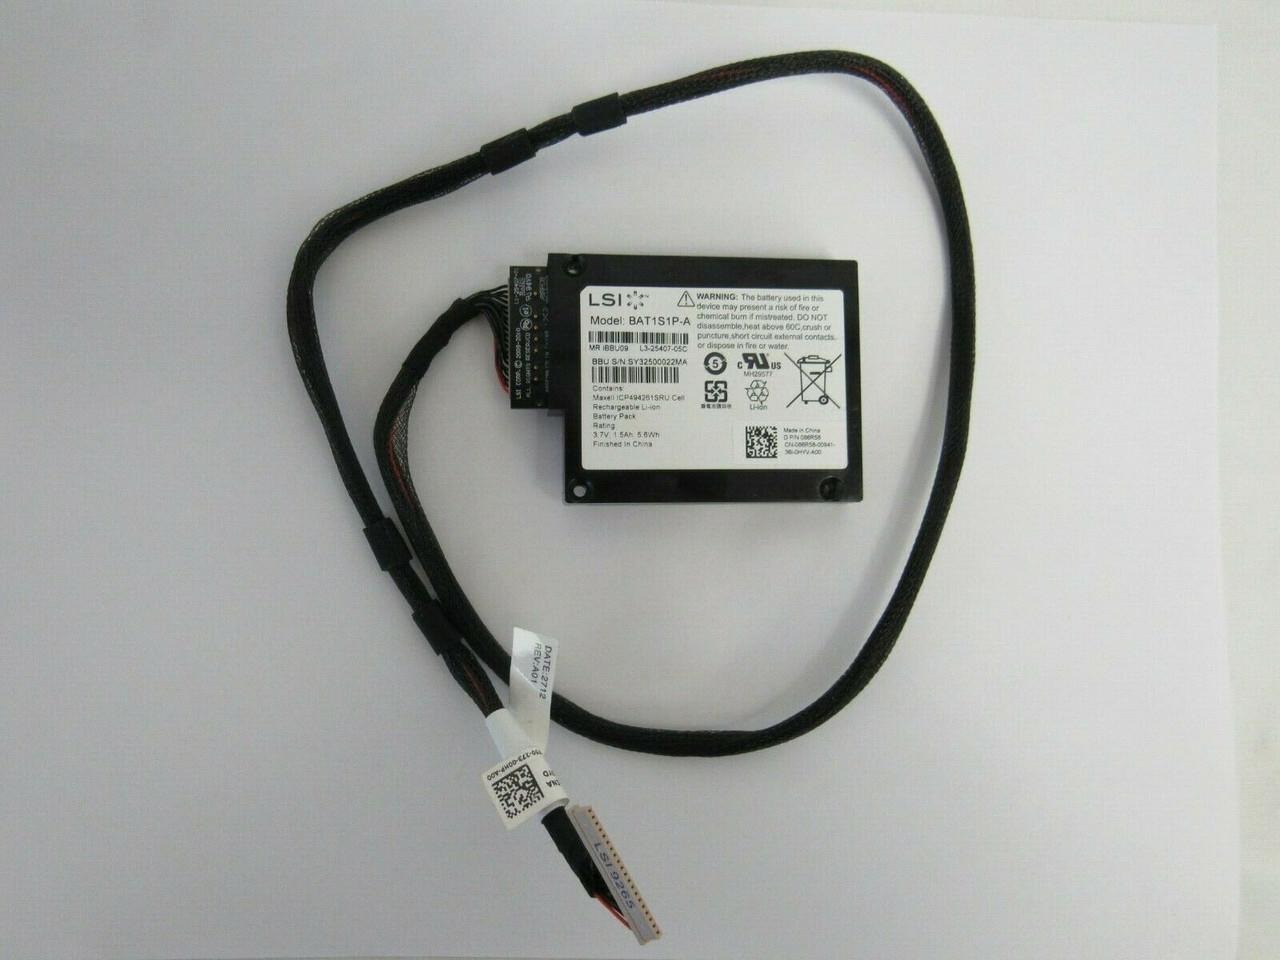 LSI BAT1S1P-A MR iBBU09 Batt LSI00279 9265 9266 9270 9271 w//Caddi /& Cable C-3